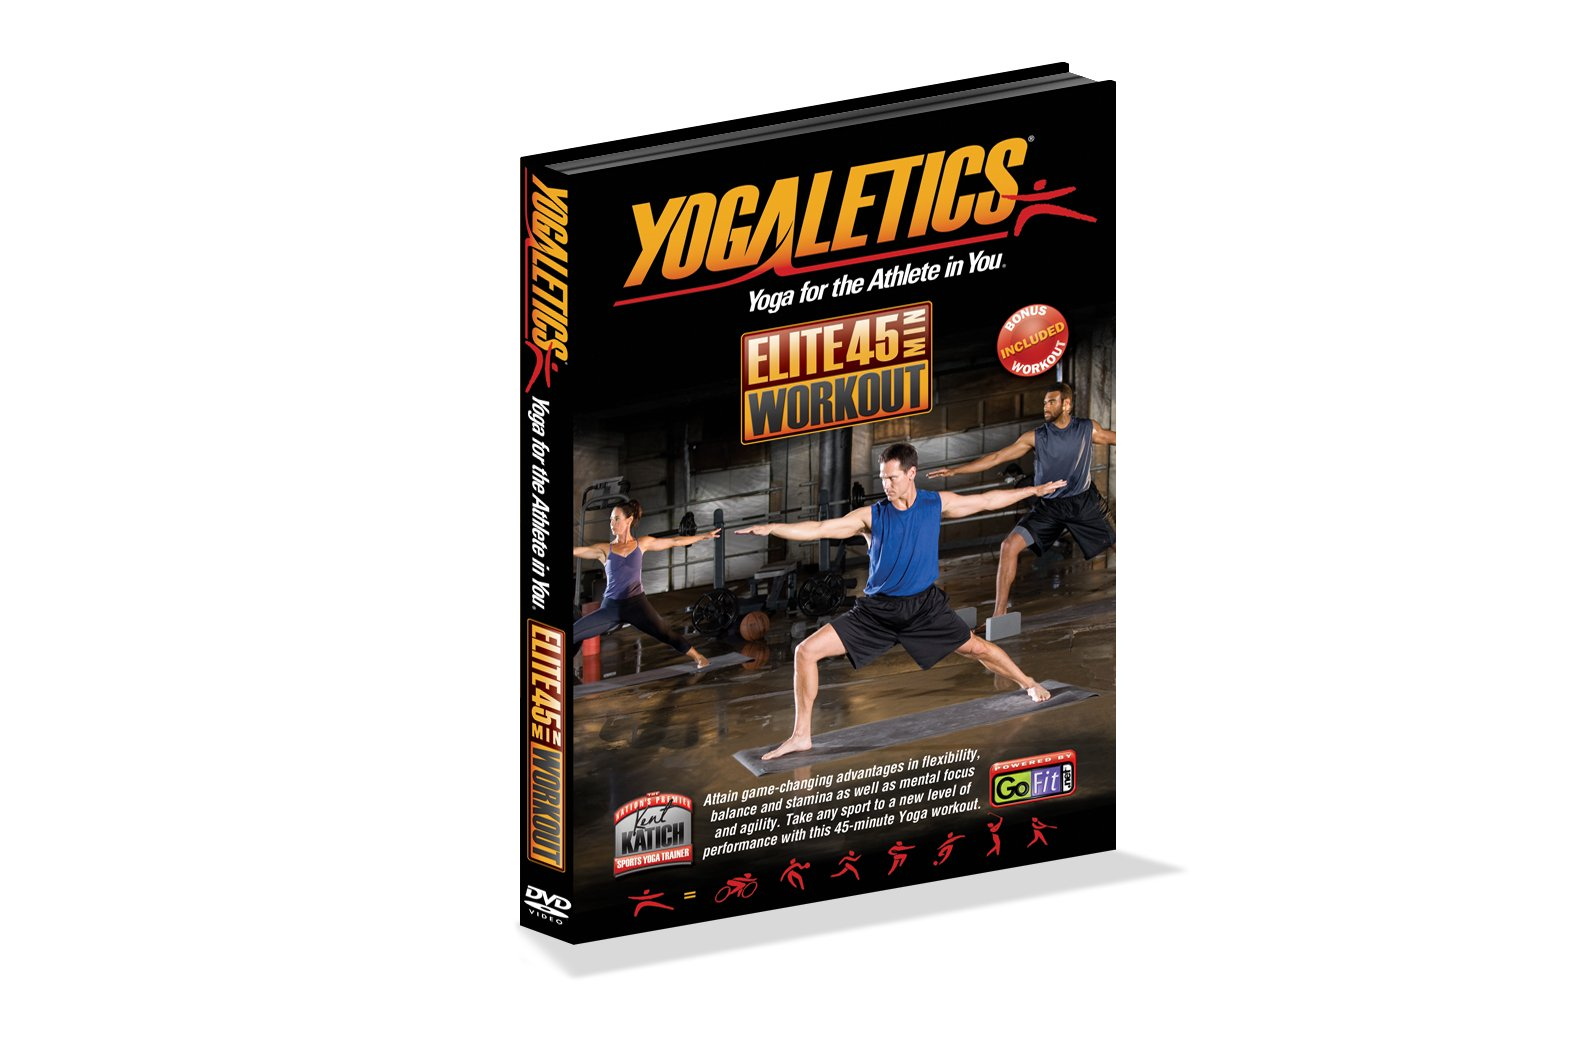 GoFit Yogaletics Elite Workout by GoFit